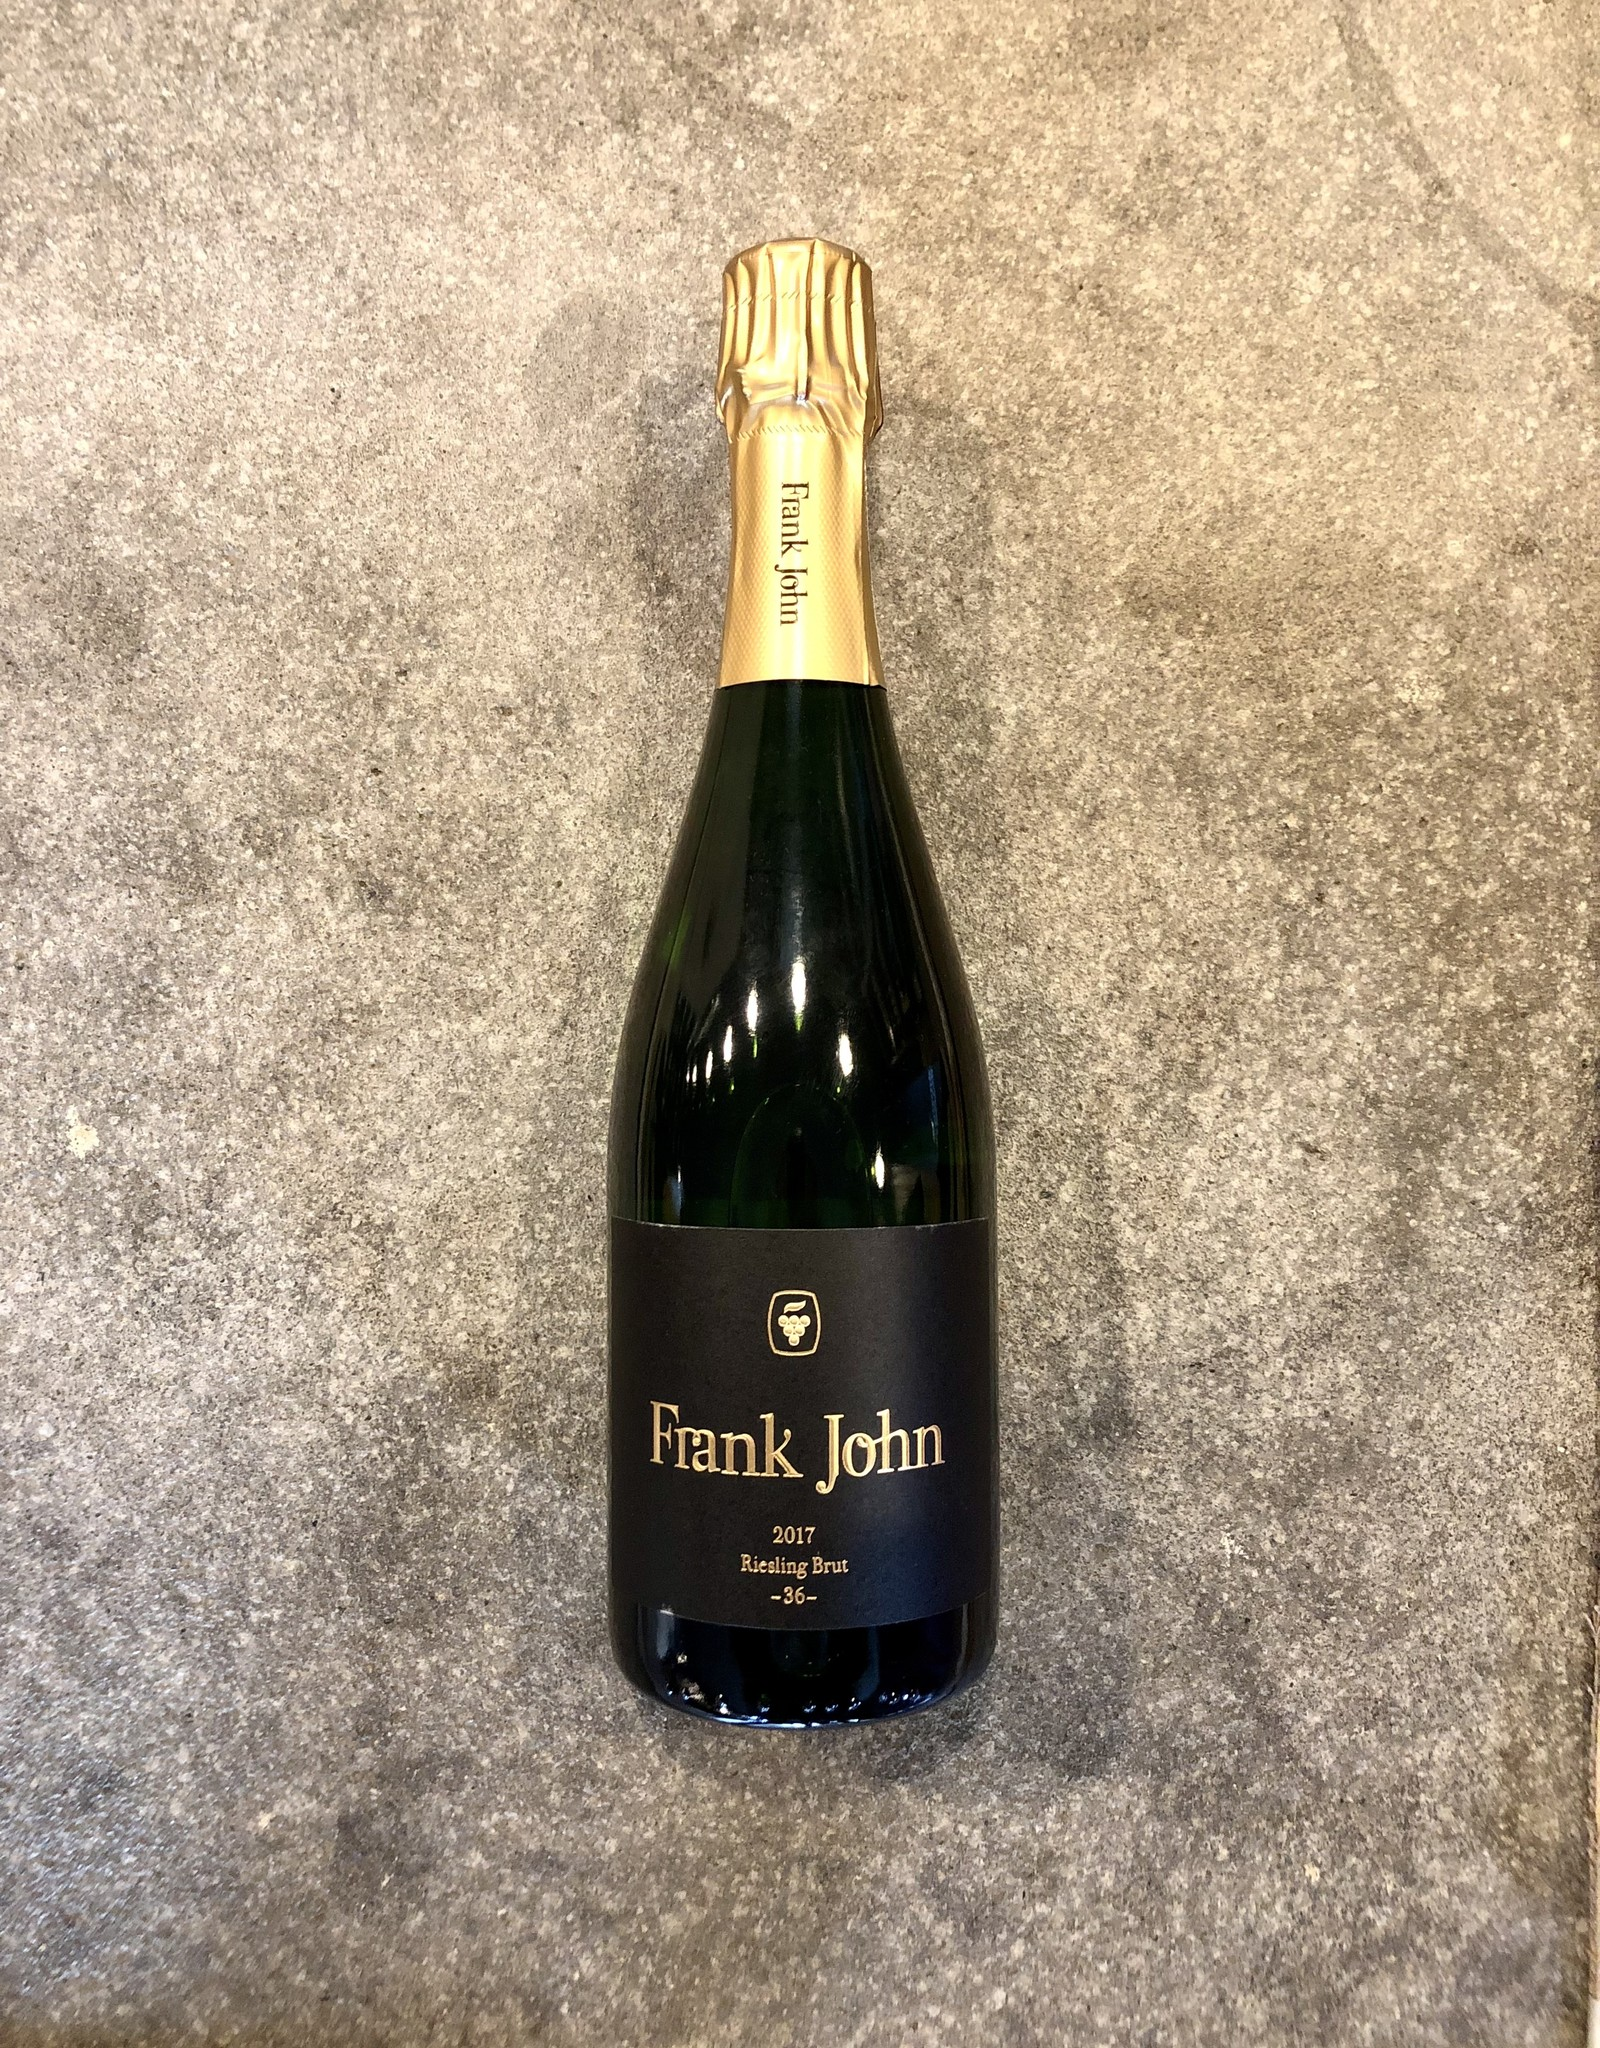 Frank John 2017 Riesling Brut -36-